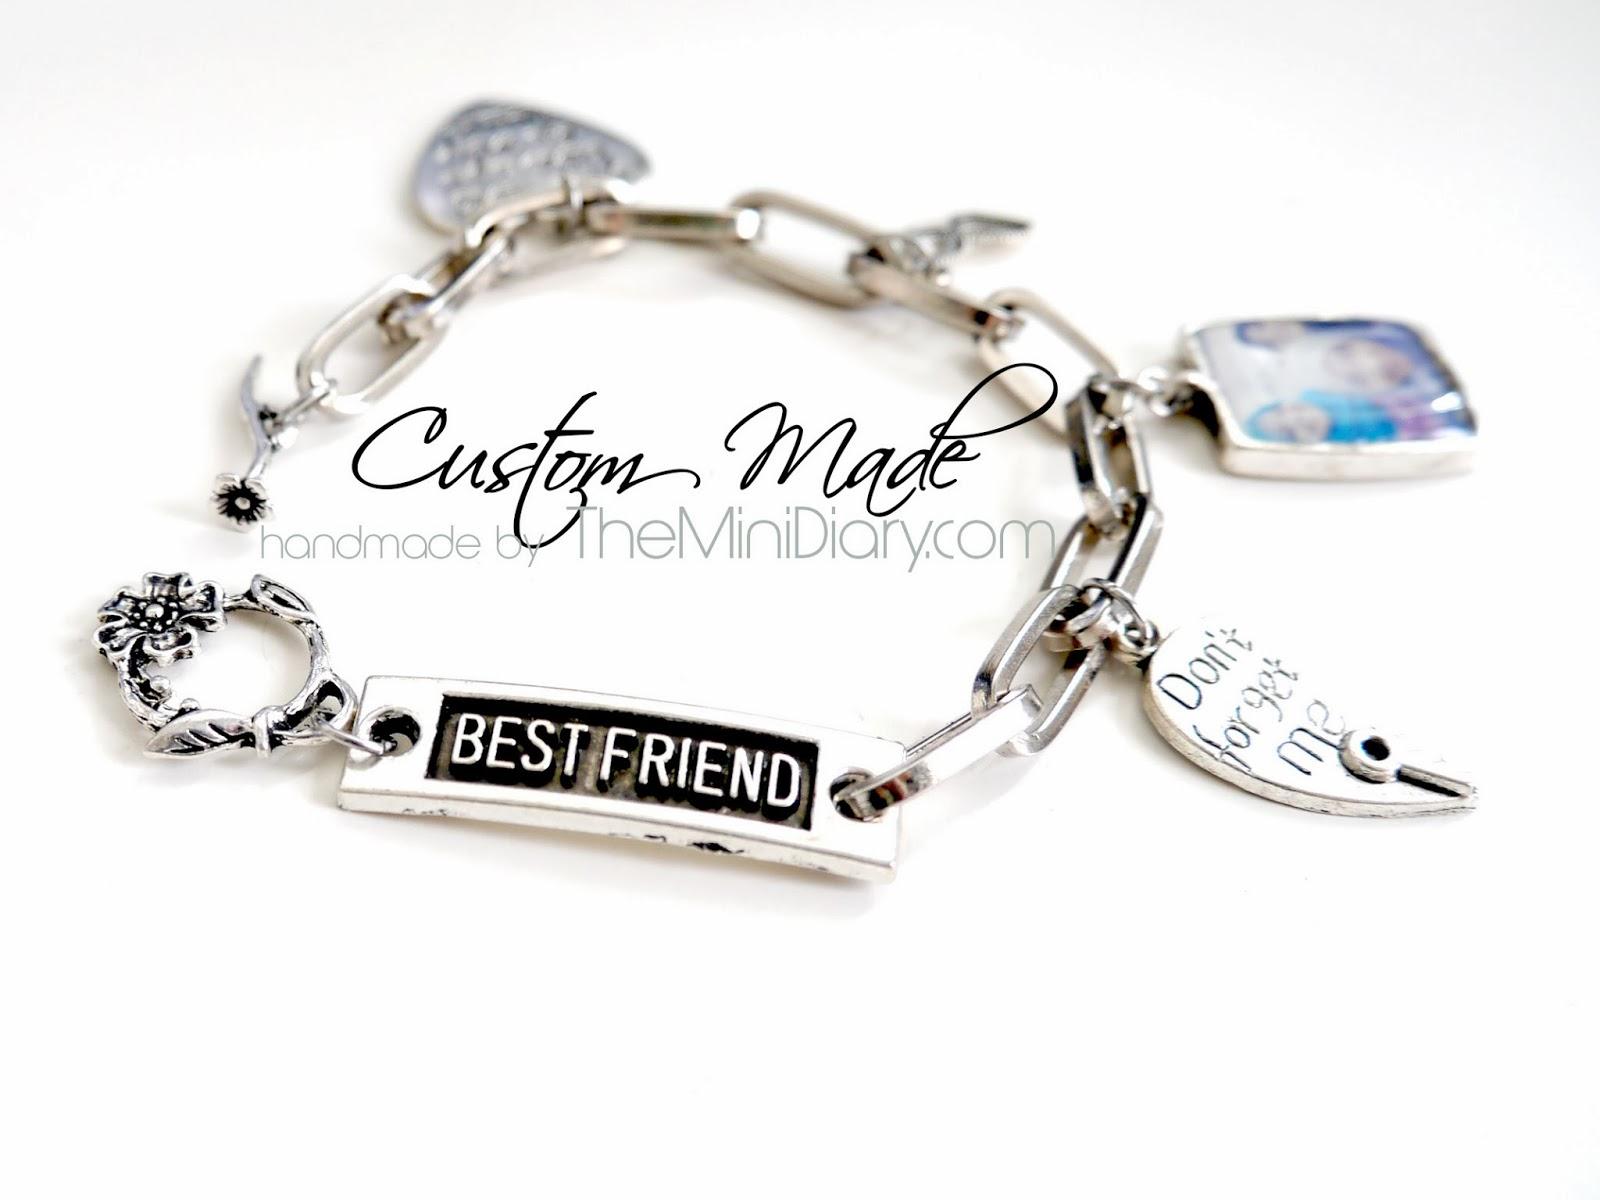 Diary Of A Miniature Enthusiast Malaysia Charm Bracelets Handmade Custom Made Jewelry Best Friend Bracelet